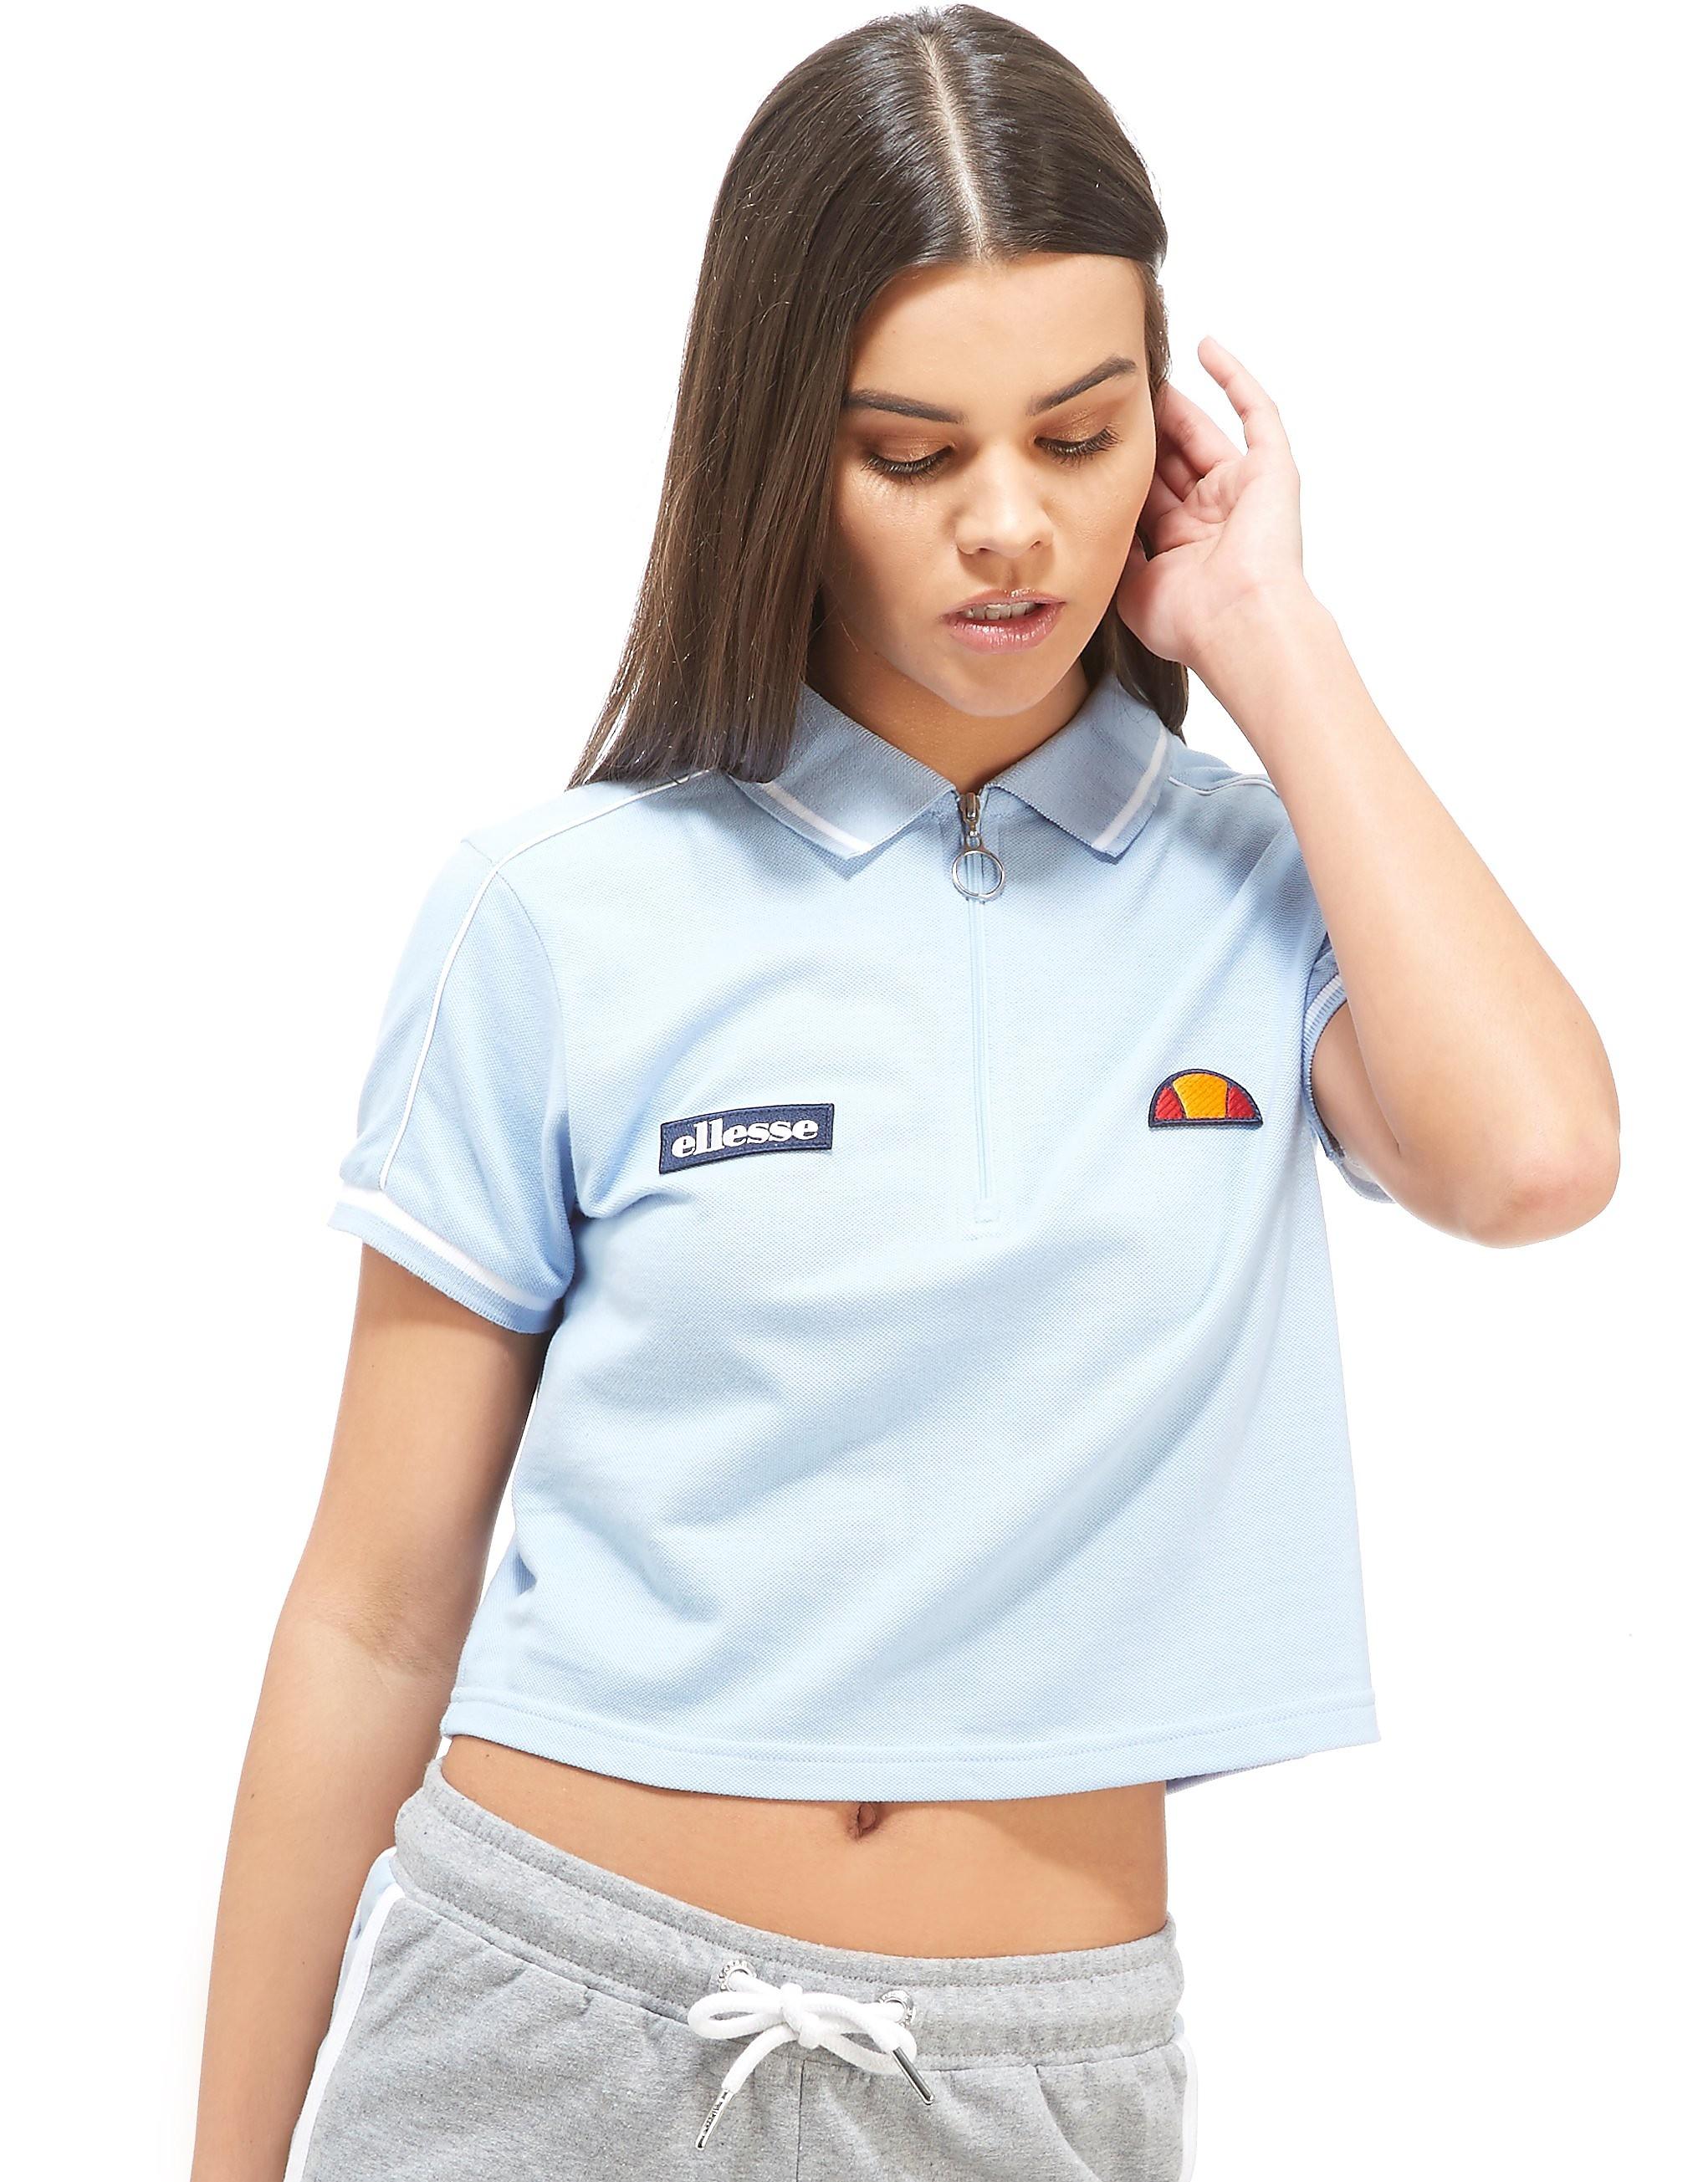 Ellesse Crop Zip Polo Shirt